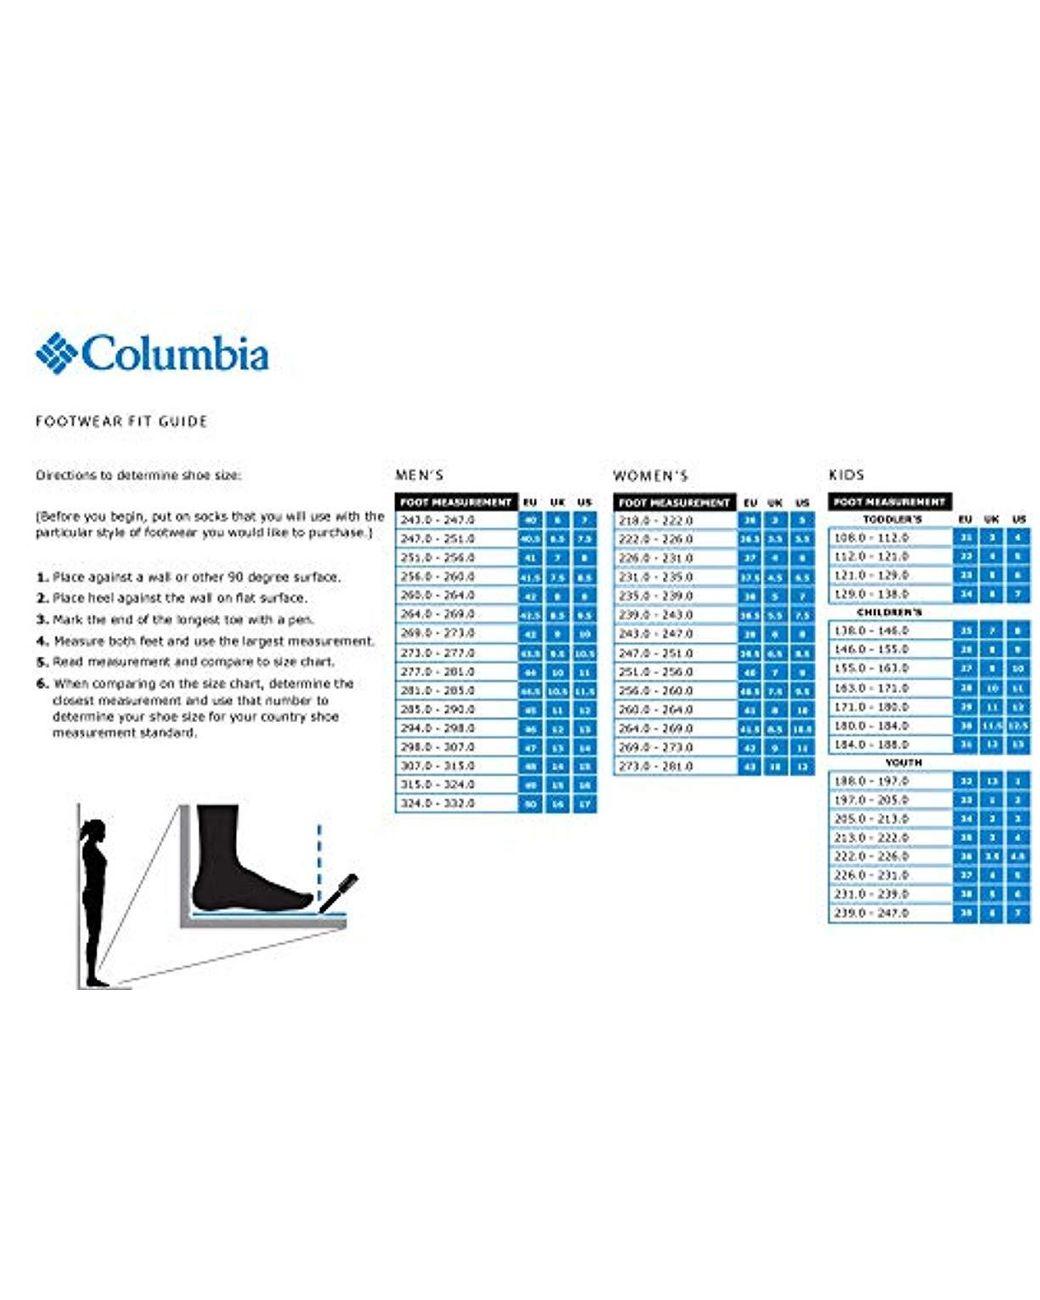 Columbia Uk Hiking 43 Slide Solana 01010 SandalsblackShark tdxhQsrCB